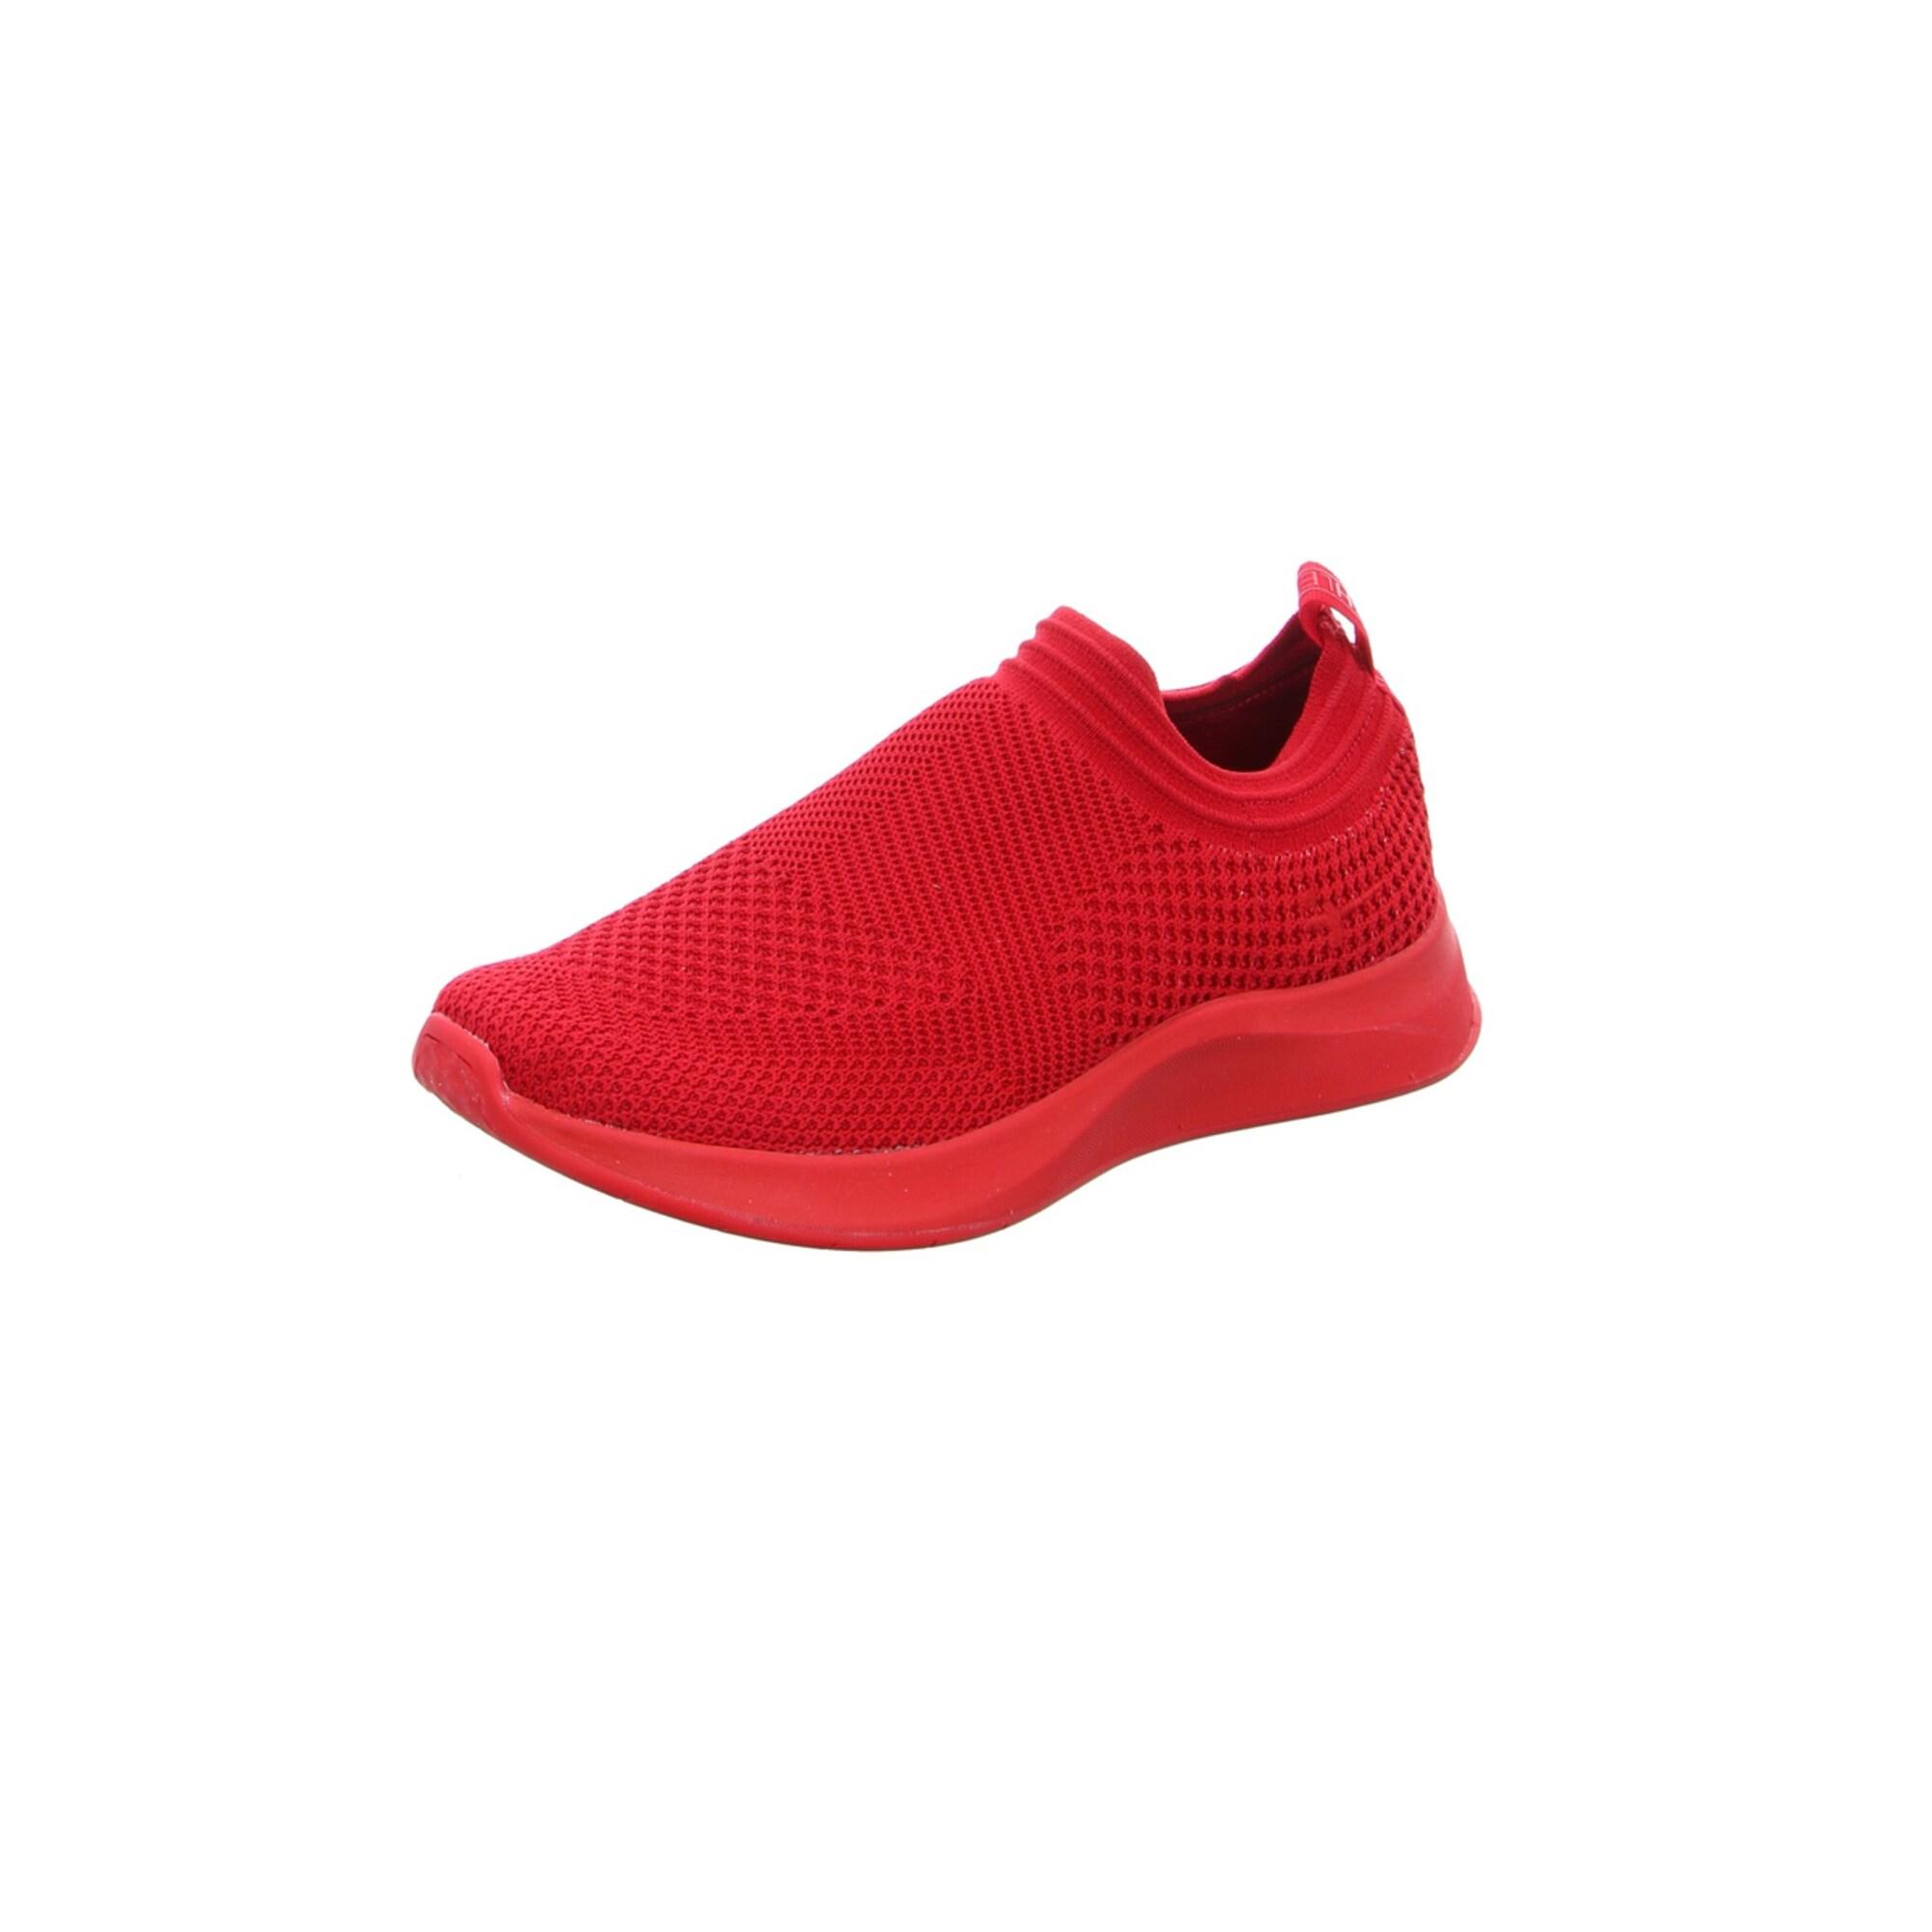 TAMARIS Slip-on obuv  svetločervená